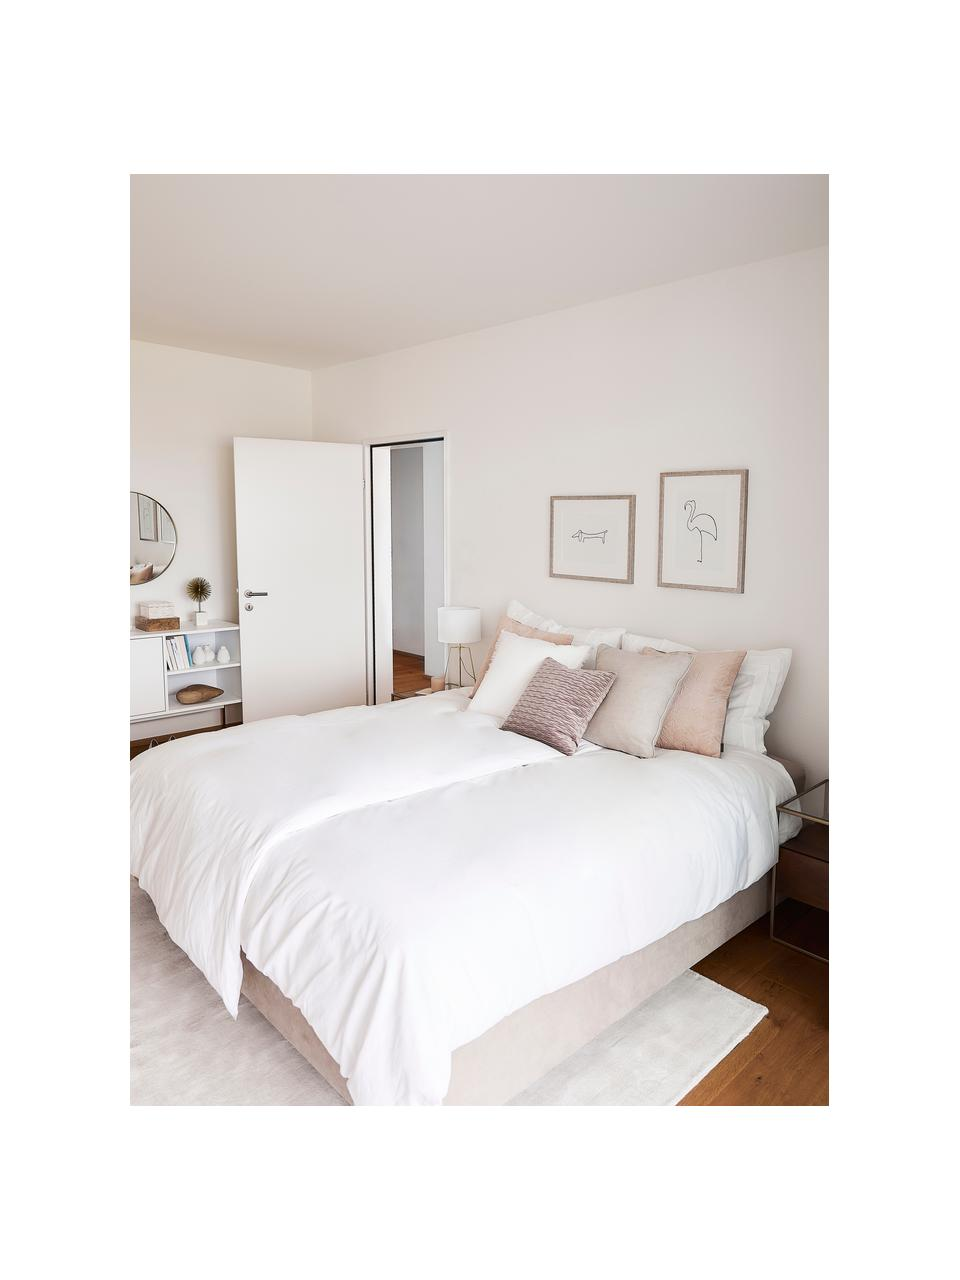 Lit à sommier tapissier beige sans tête de lit Enya, Tissu beige